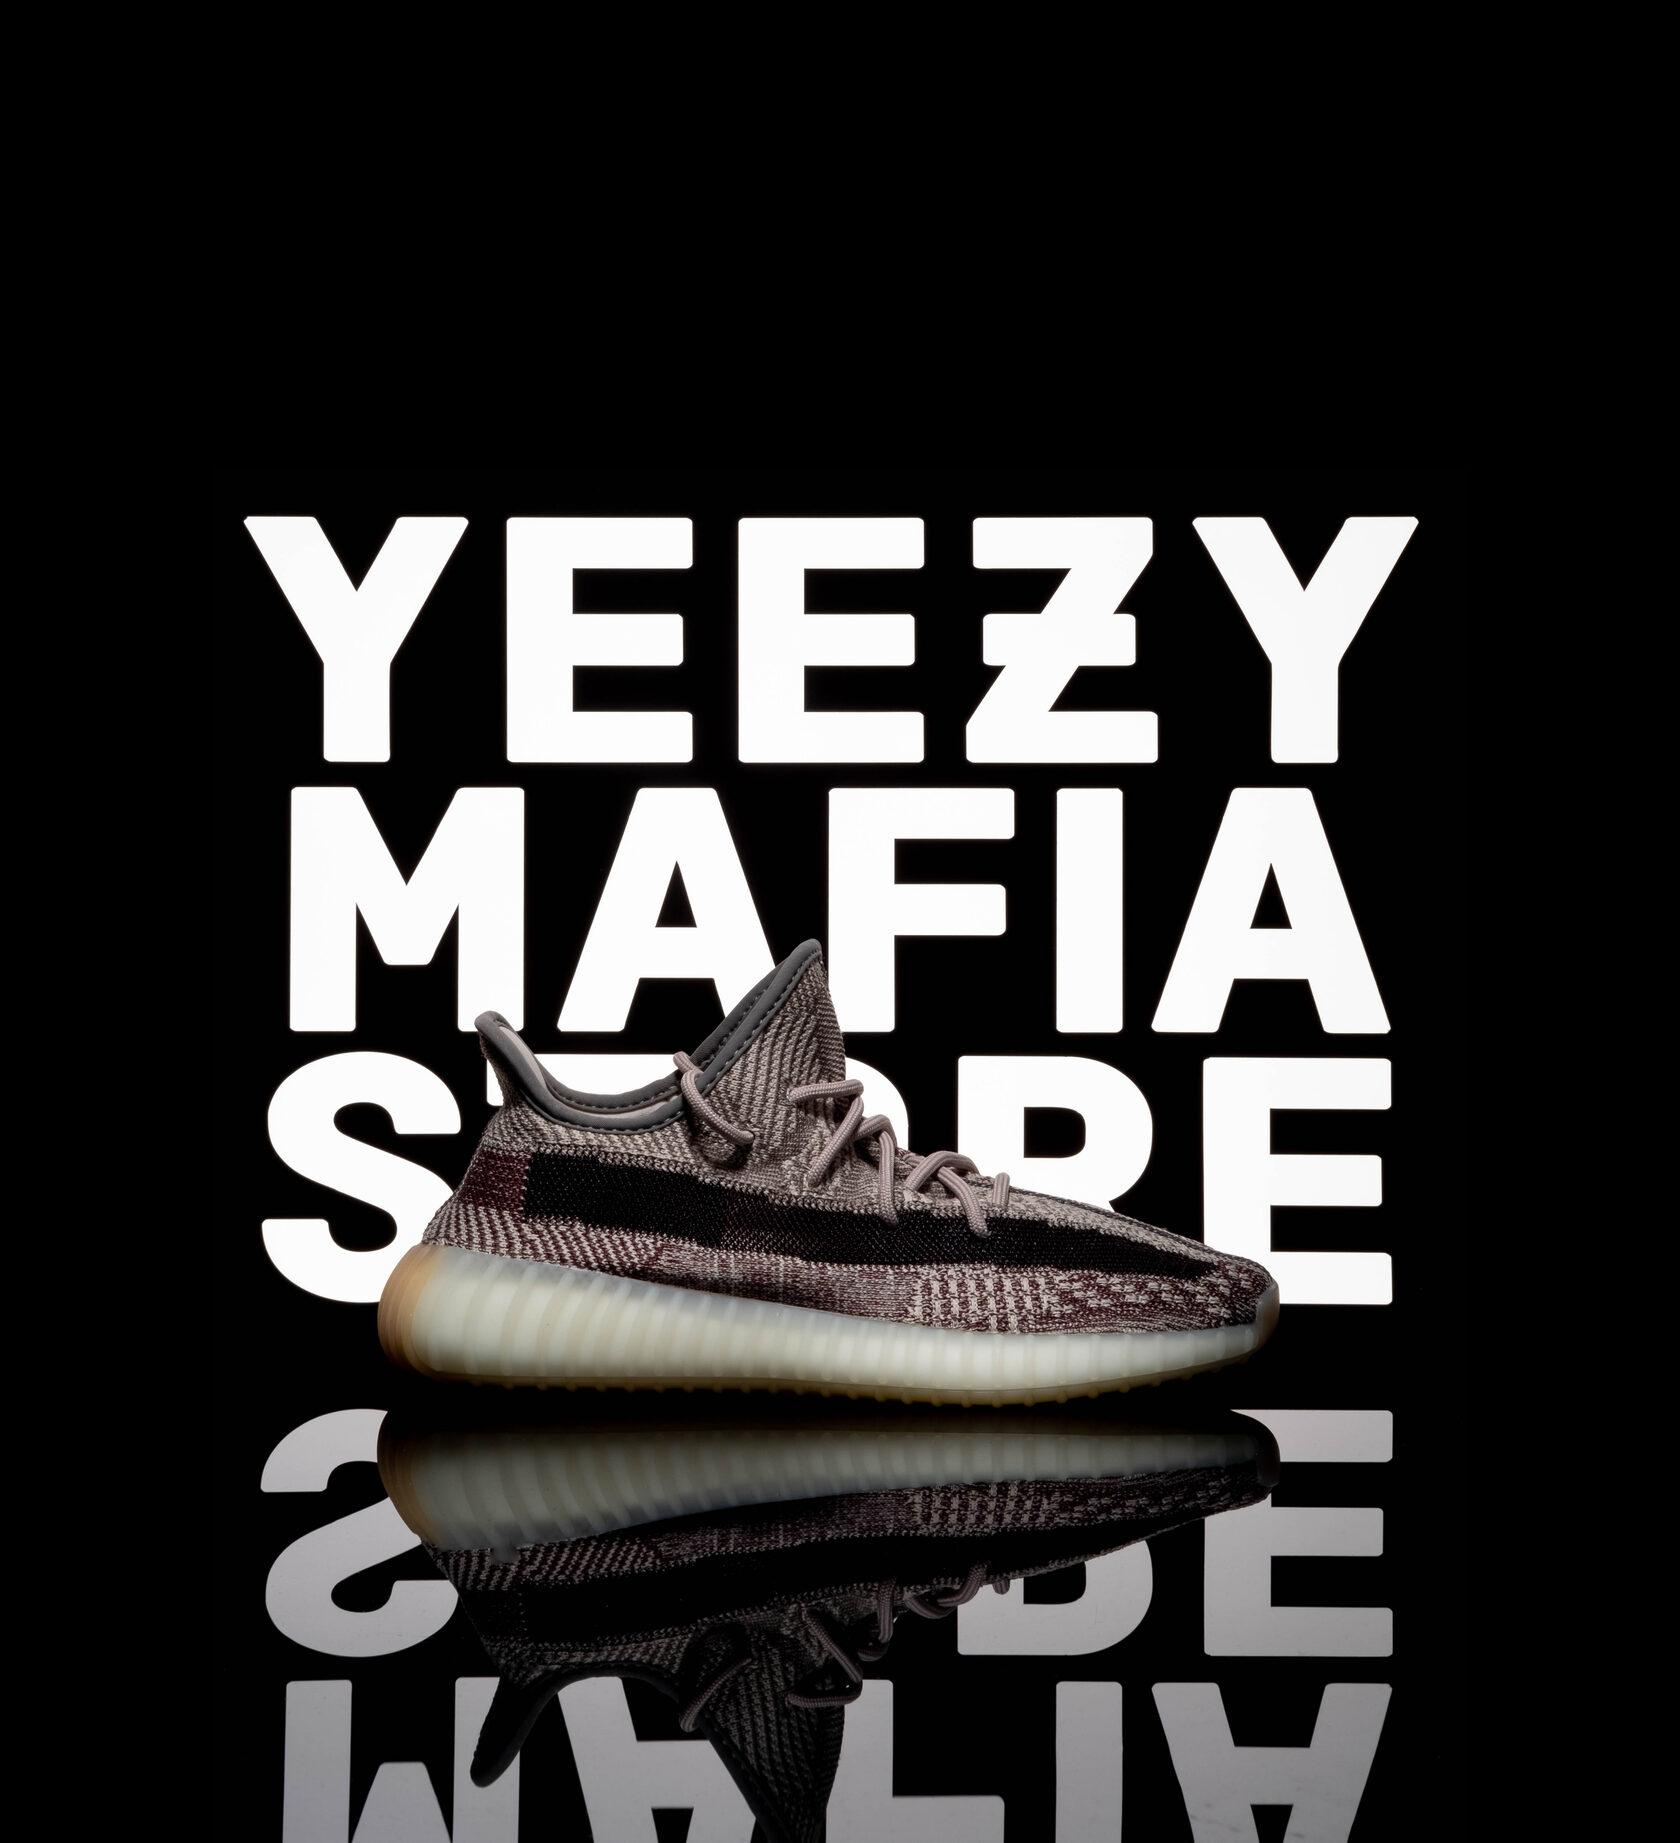 Adidas Yeezy Boost 350 V2 Zyon купить